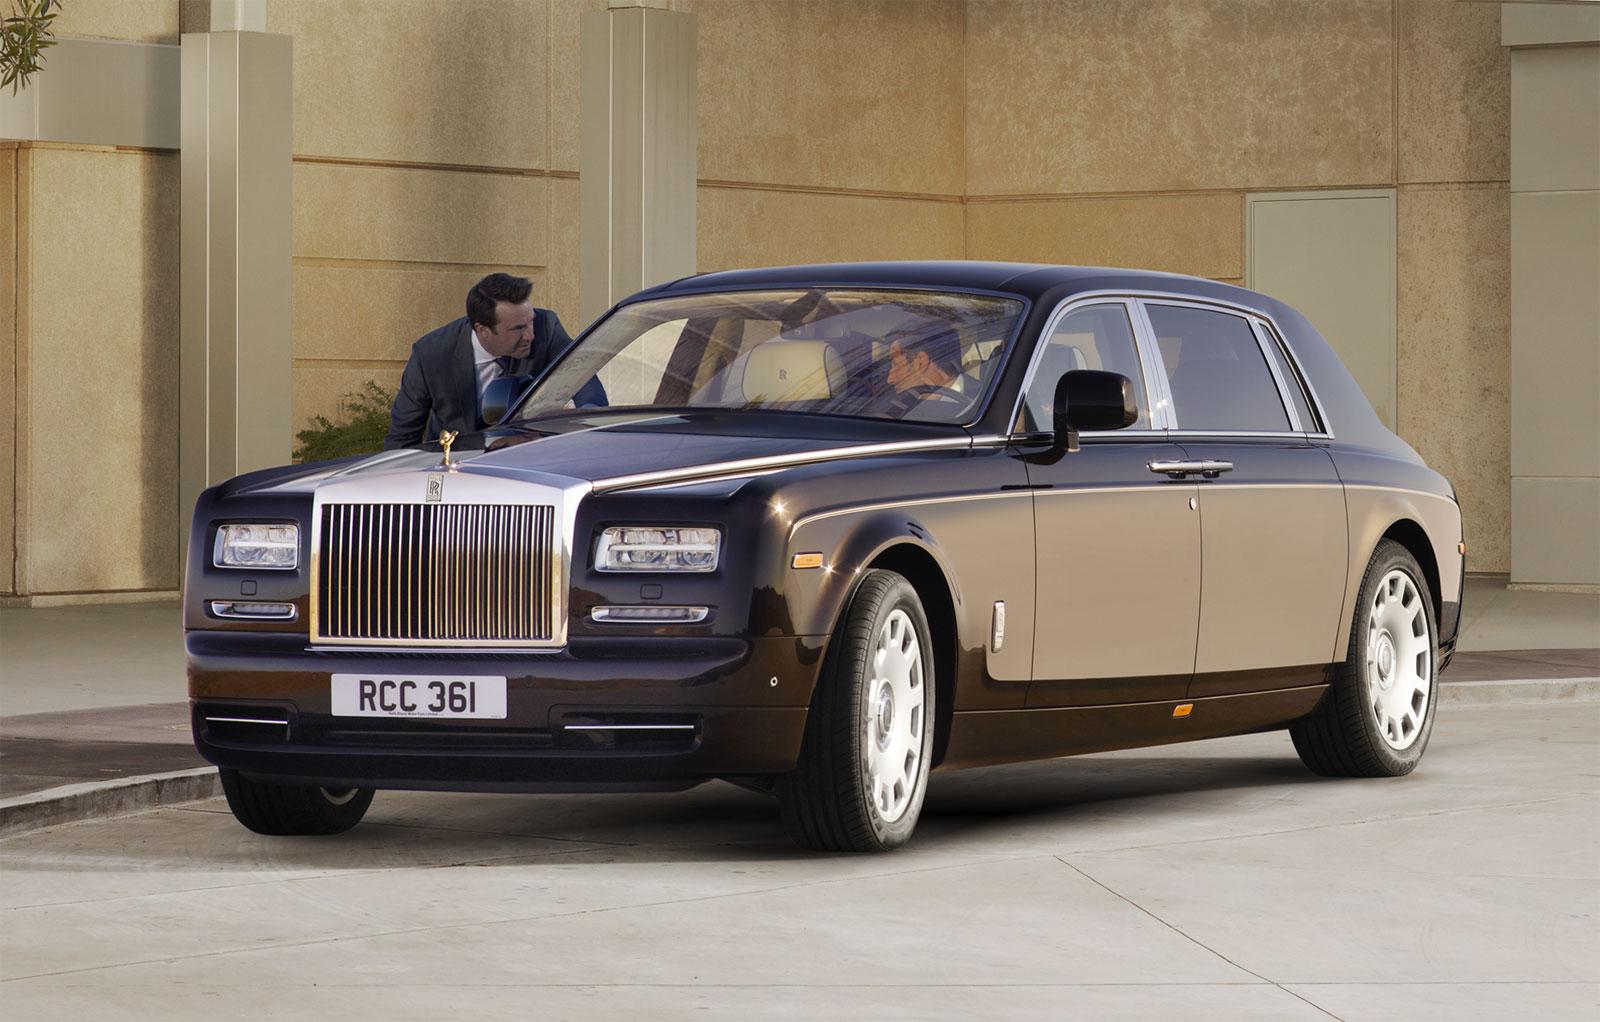 rolls royce phantom extetnded wheelbase 2013 car barn sport. Black Bedroom Furniture Sets. Home Design Ideas